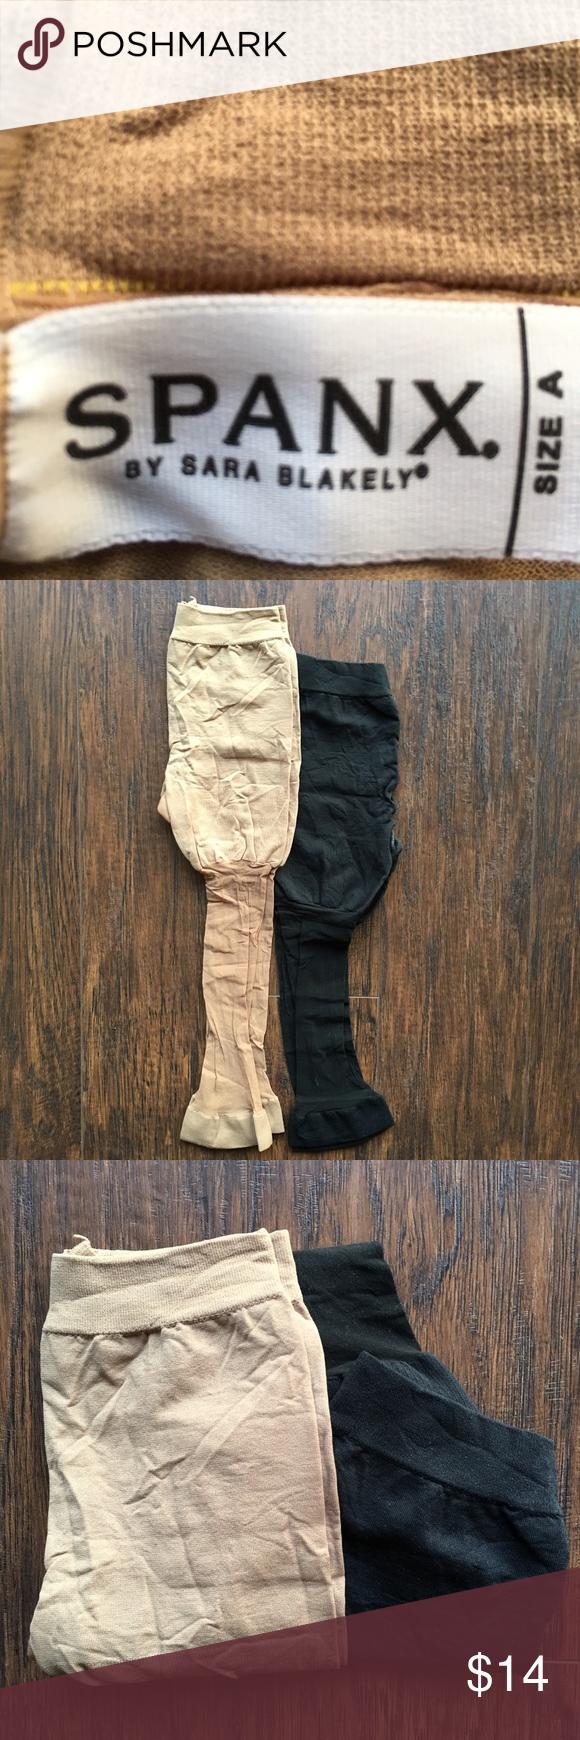 Spanx black/neutral NWOT Never worn. Size A fits XS/S SPANX Intimates & Sleepwear Shapewear